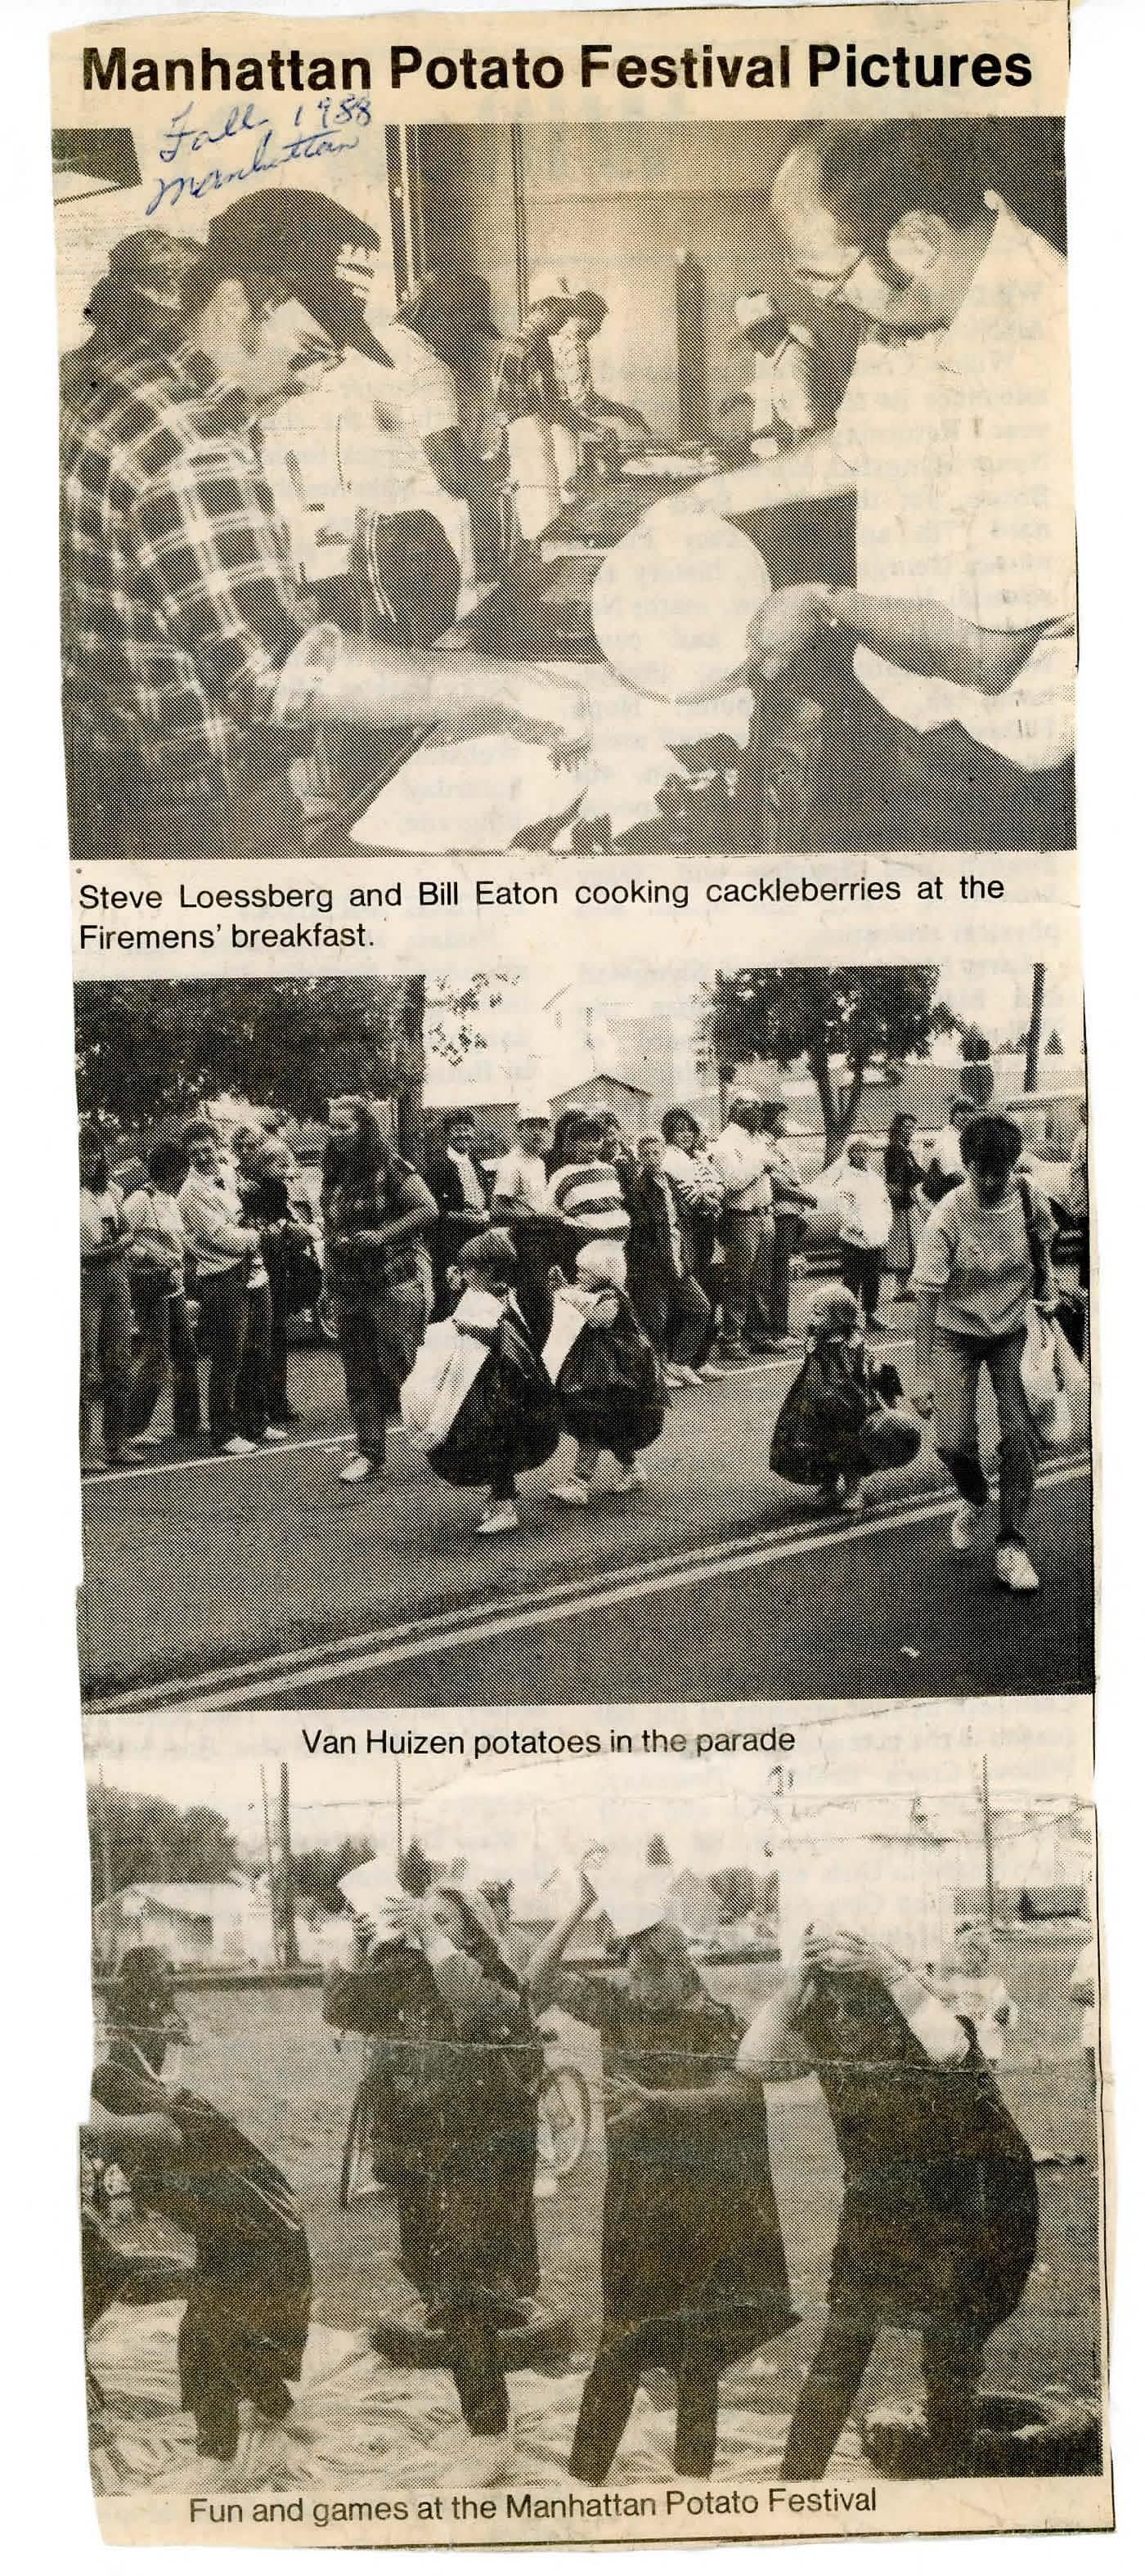 Manhattan_Potato_Festival_Pictures_1988.jpg